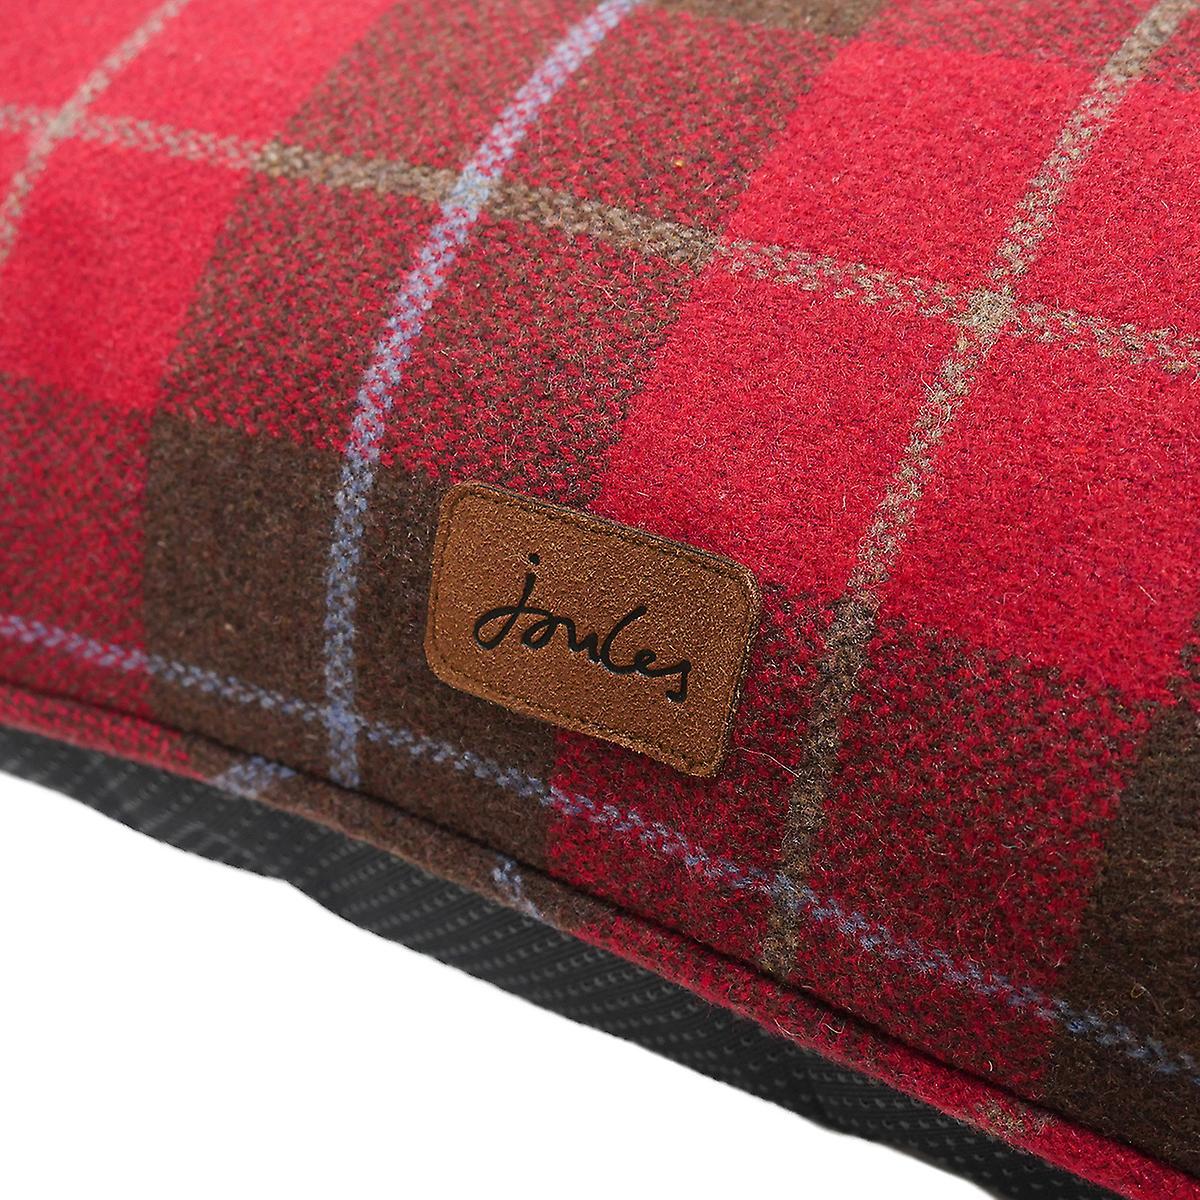 Joules Heritage Tweed Mattress